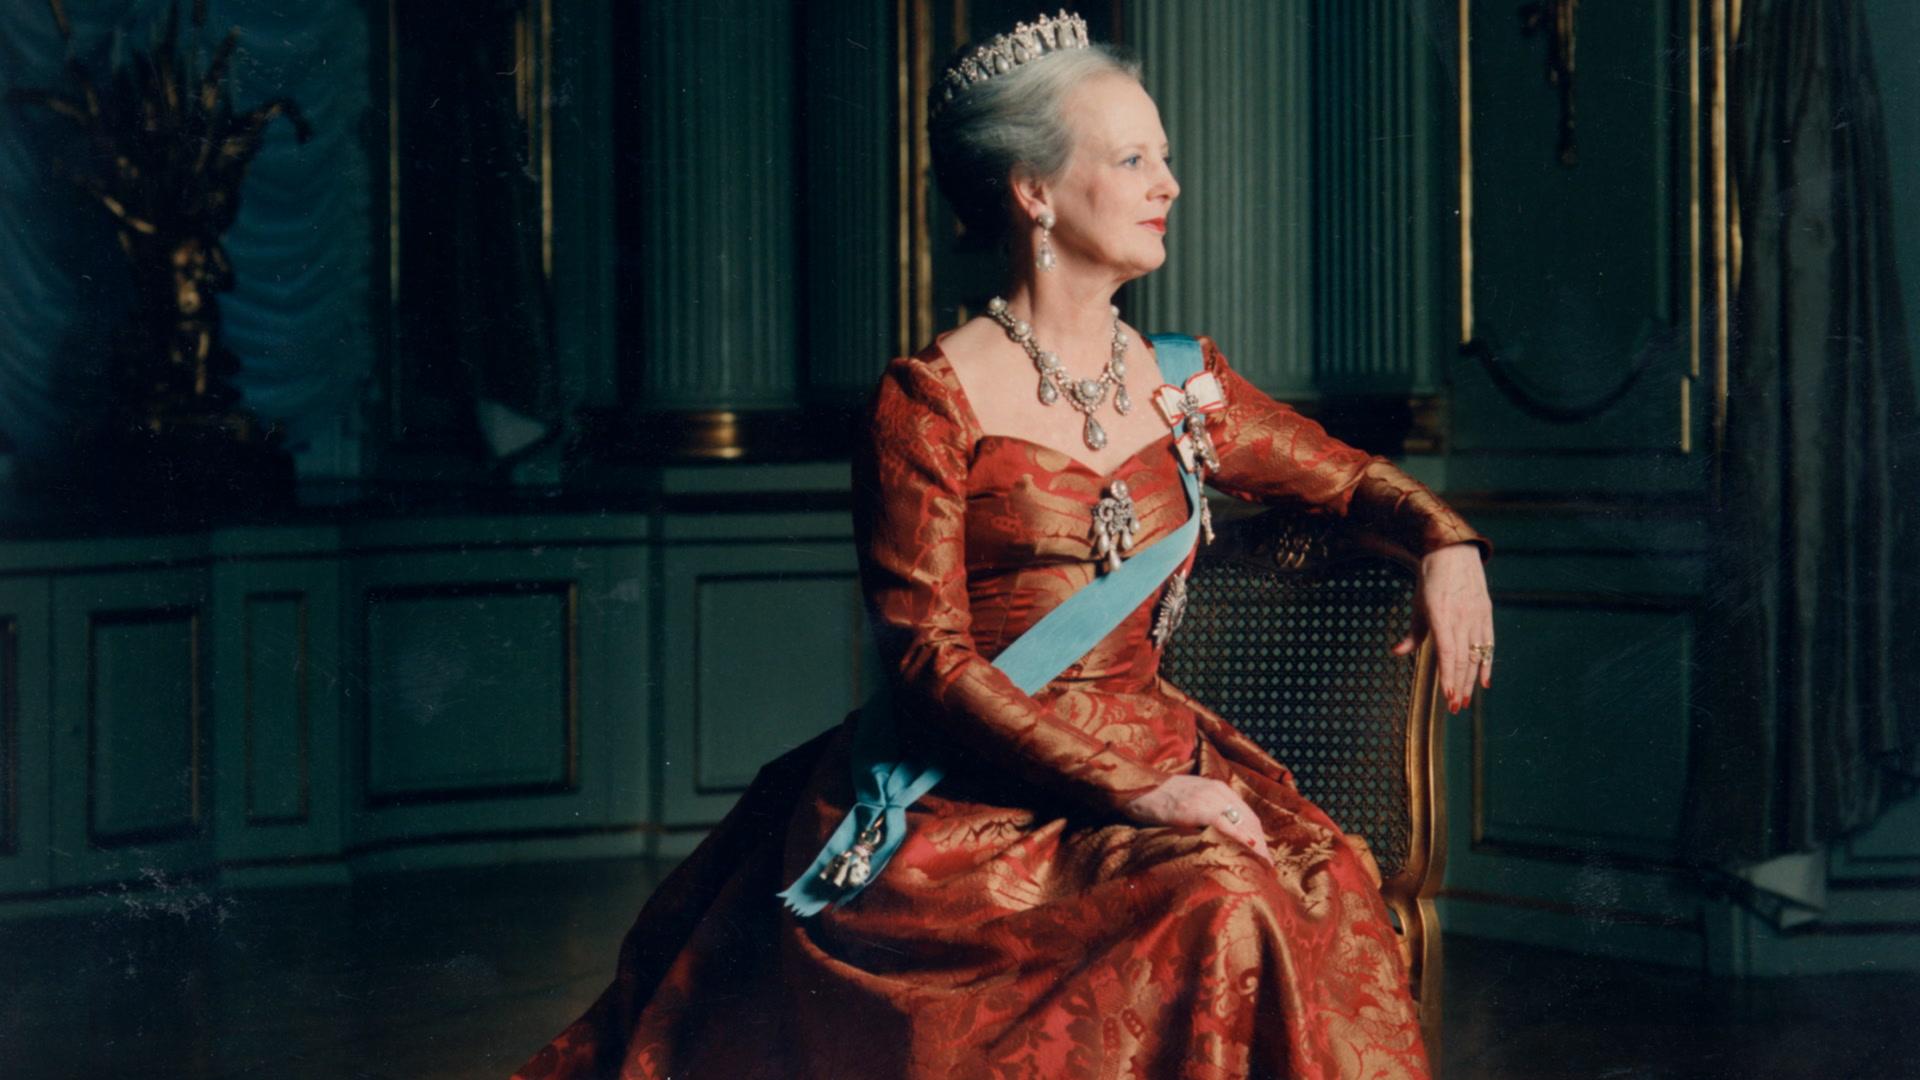 La vida de la reina Margarita de Dinamarca